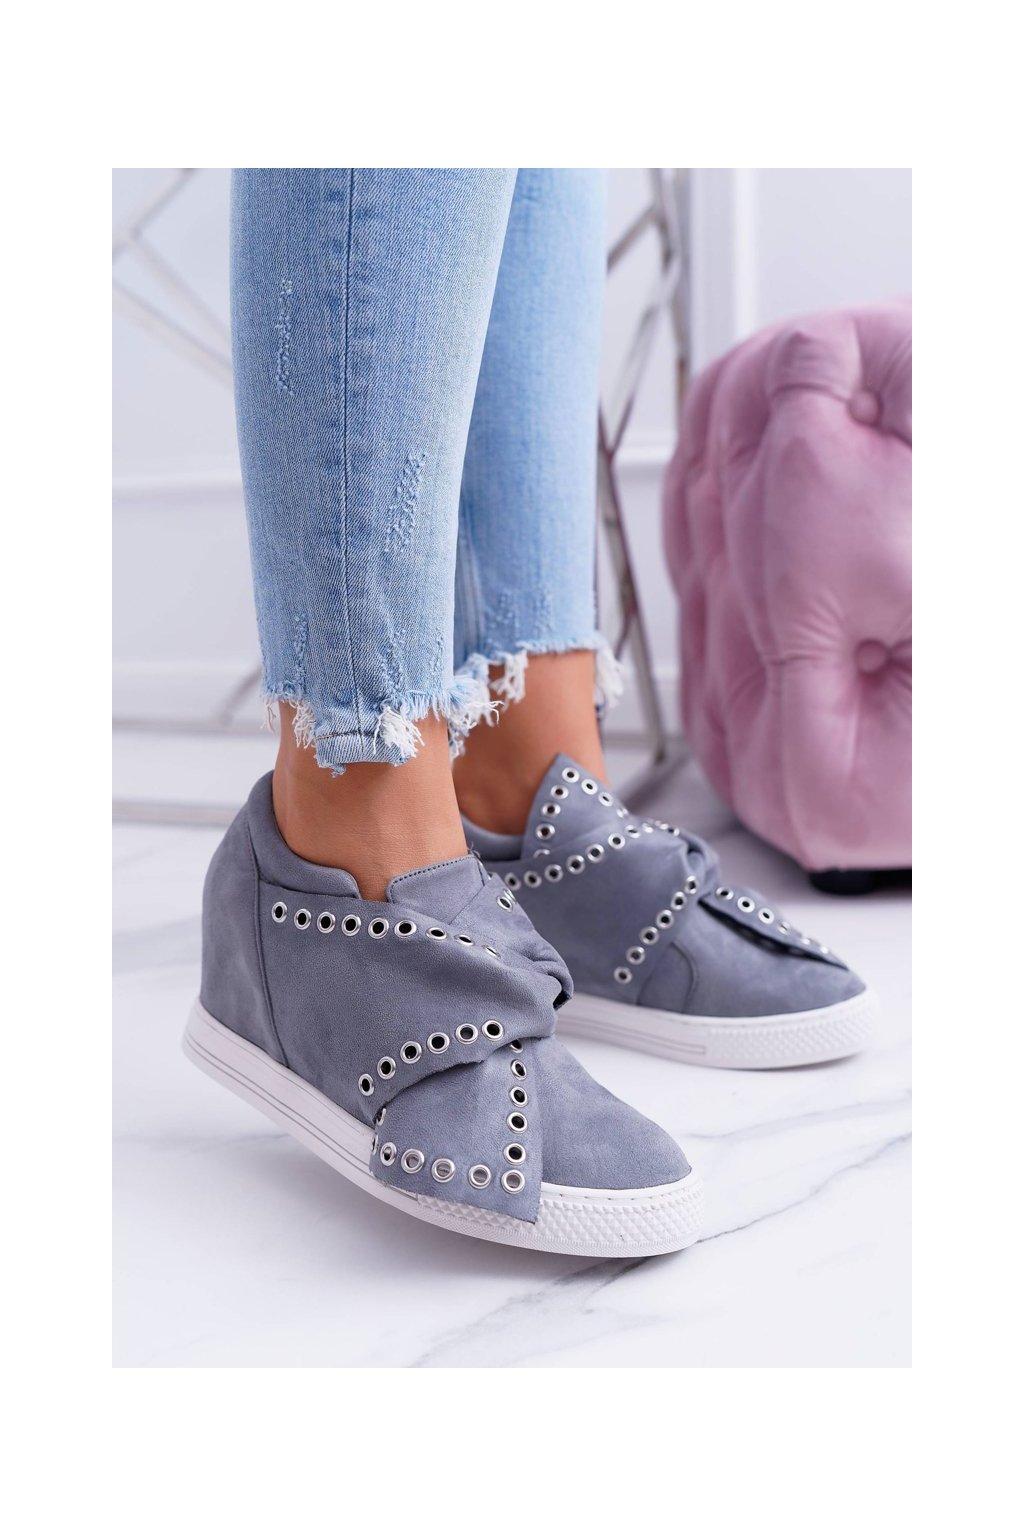 Dámska obuv sneakers sivé LU BOO Margo